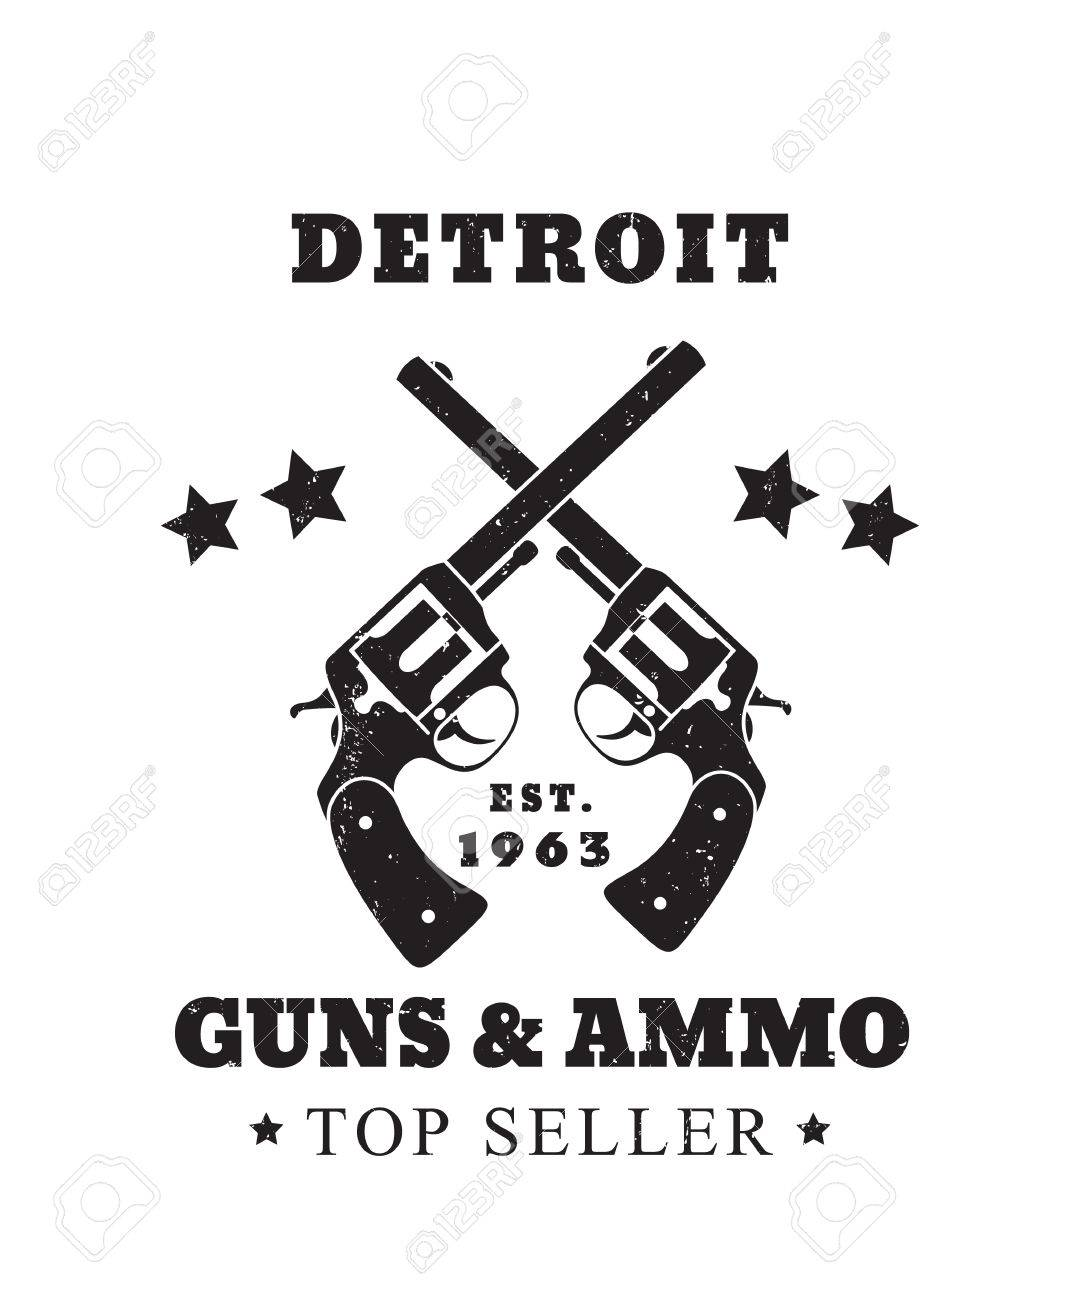 Detroit Guns And Ammo Grunge Emblem Vector Illustration Royalty